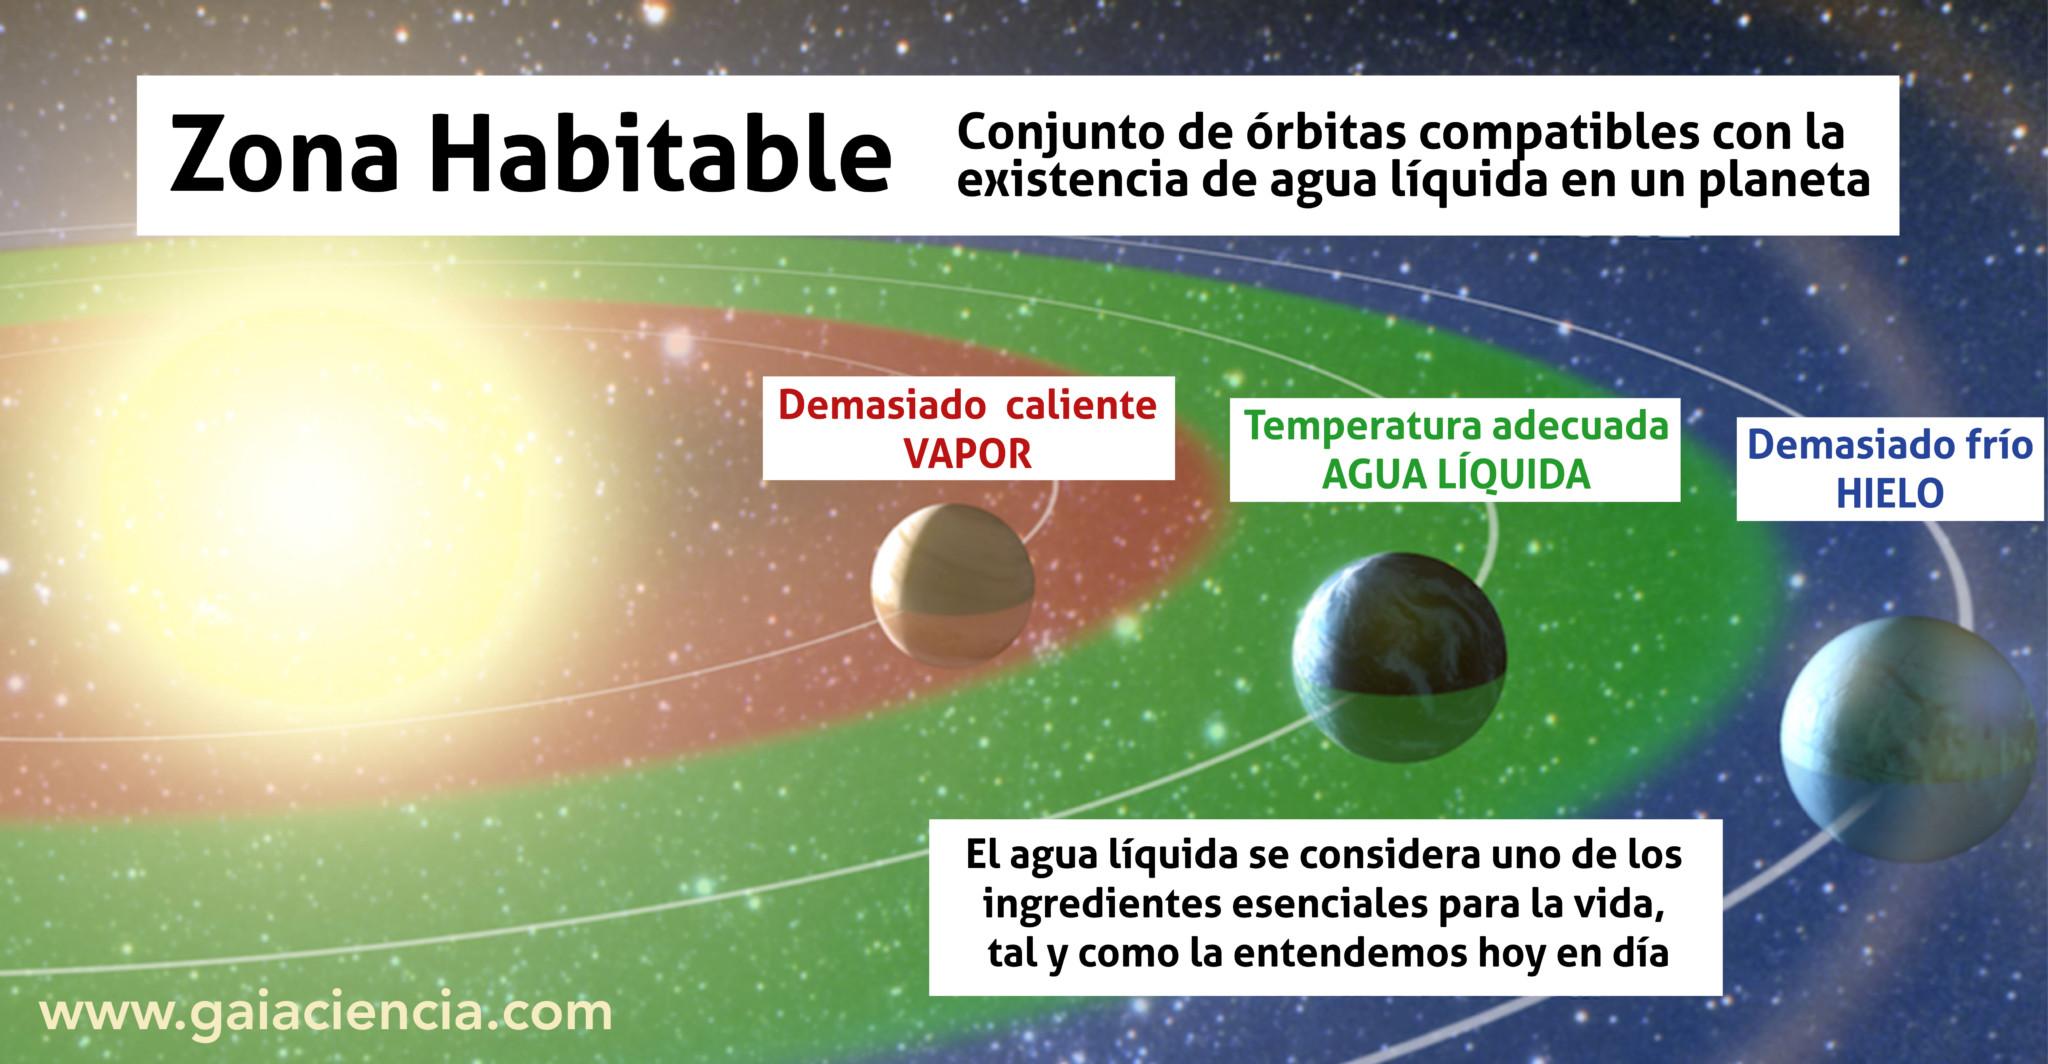 habitable-zones-01